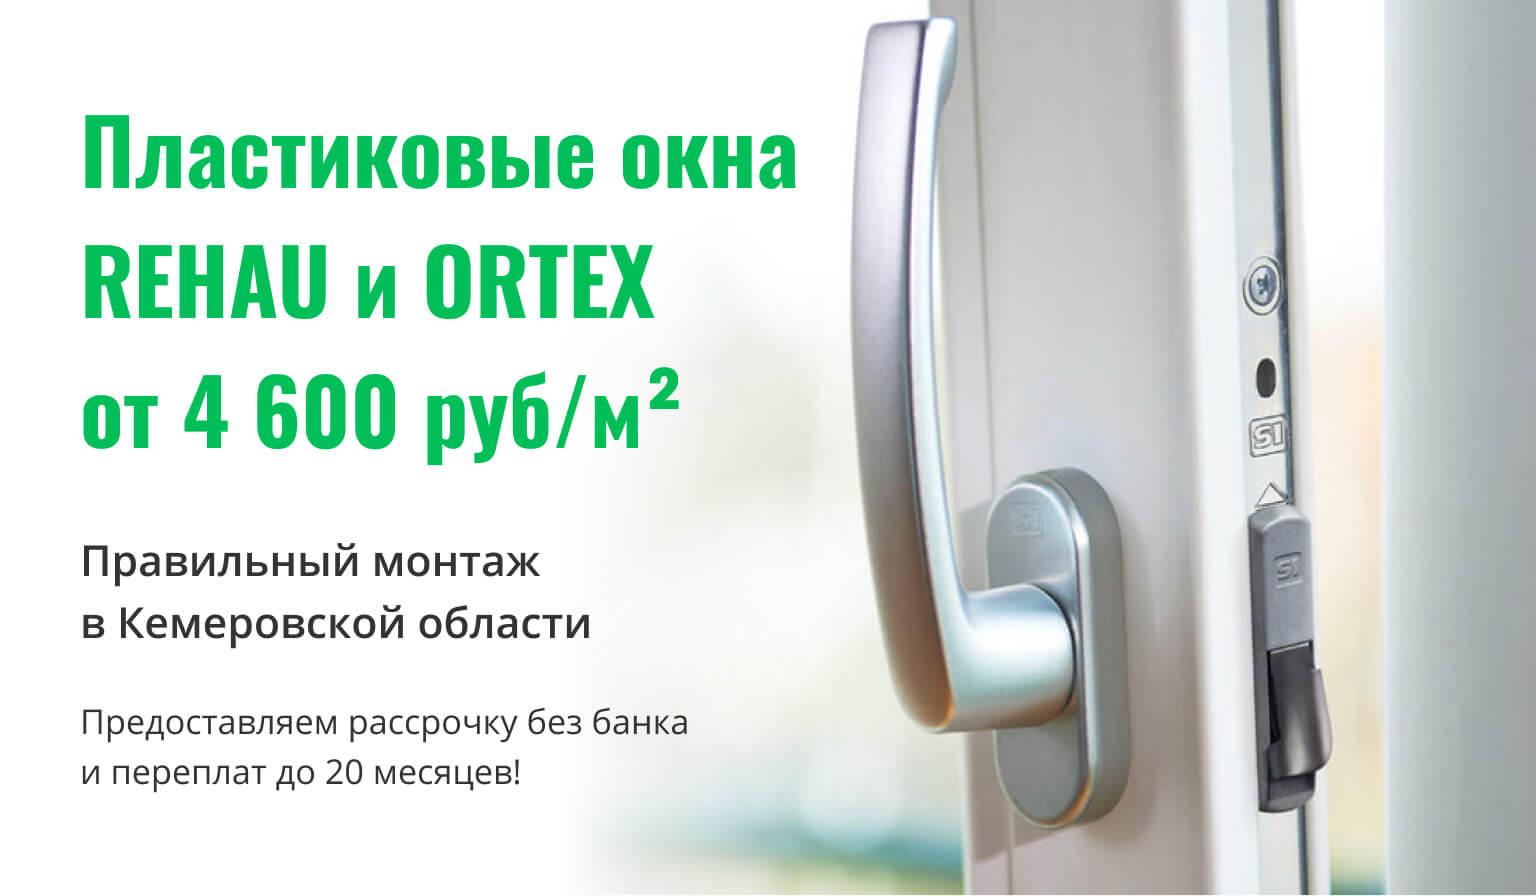 пластиковые окна REHAU и ORTEX